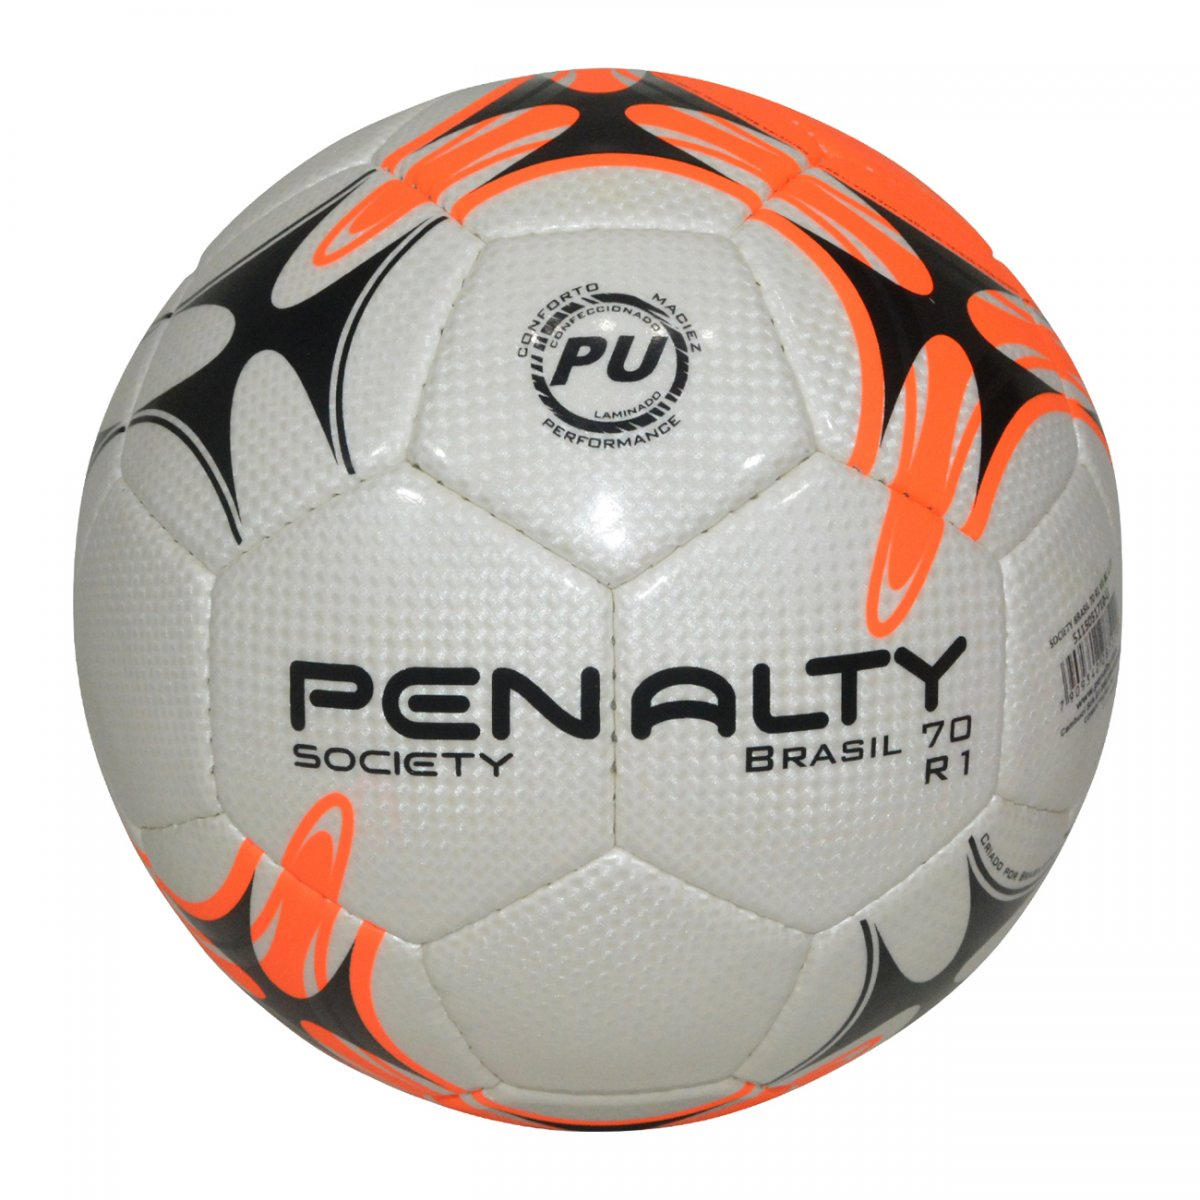 b1475bb372 Bola Society Penalty Brasil 70 R1 VII 5115051710 - Branco laranja preto -  Chuteira Nike